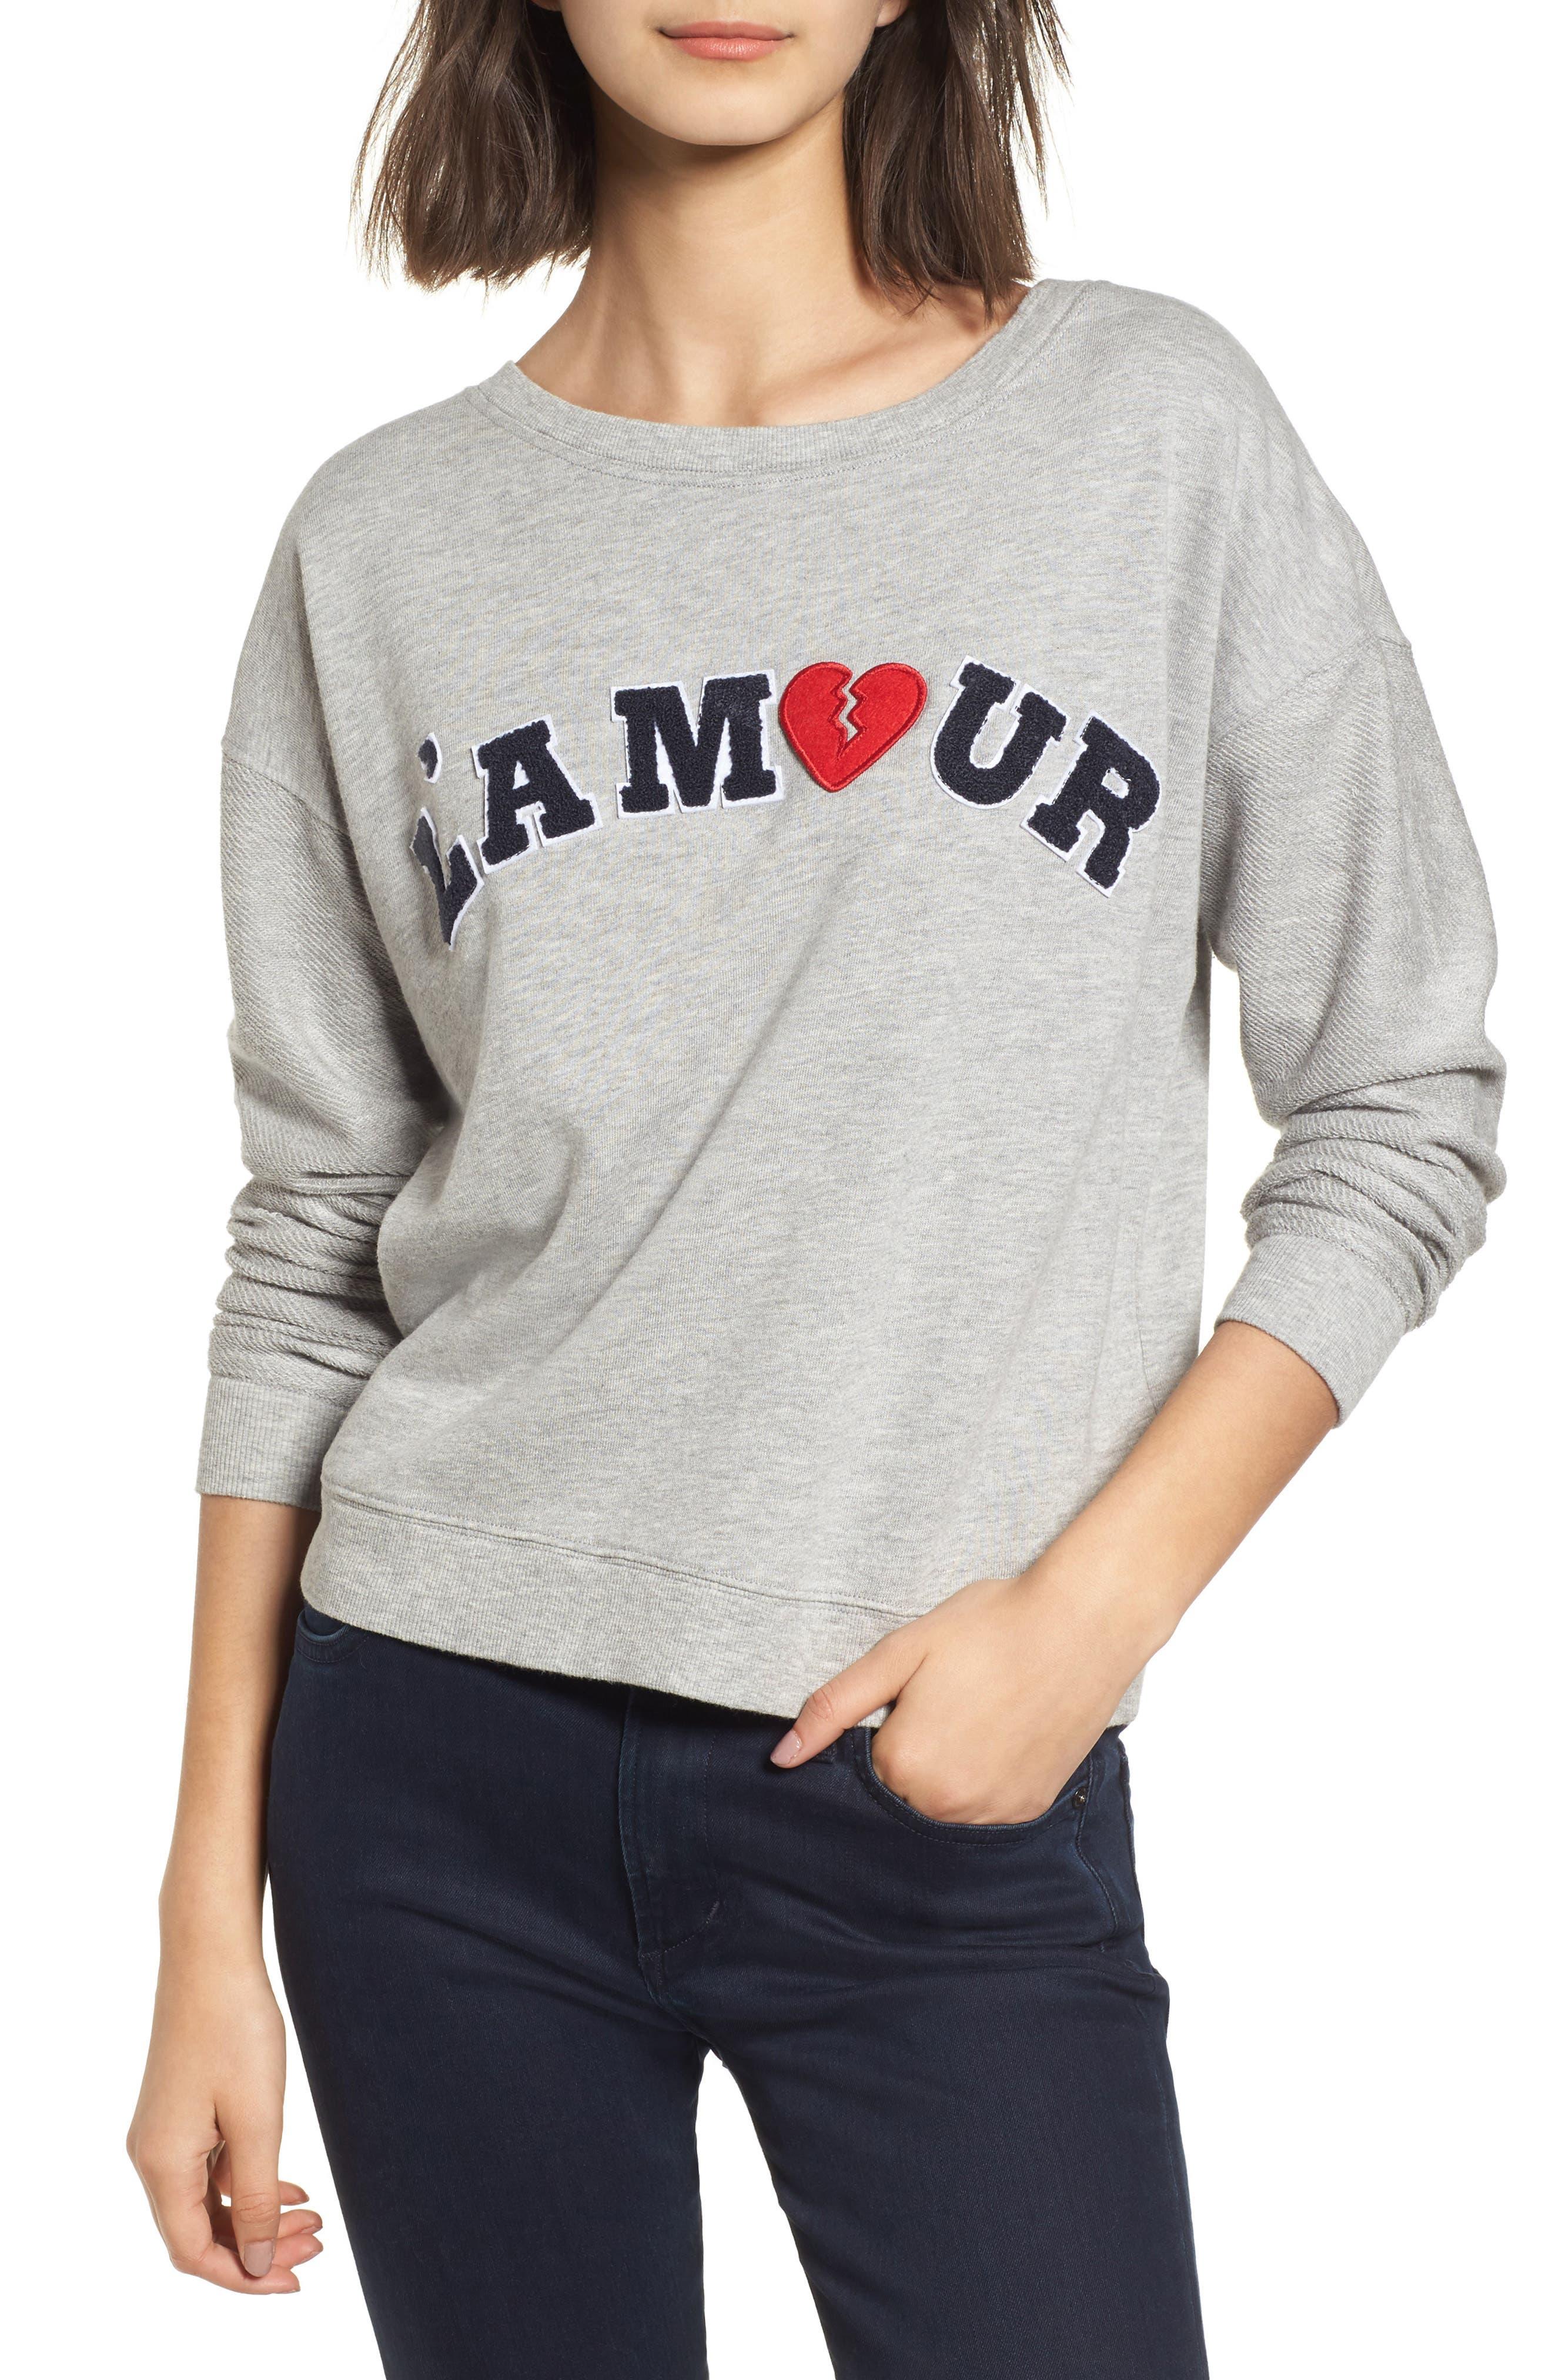 Kelli Paris Sweatshirt,                             Main thumbnail 1, color,                             032